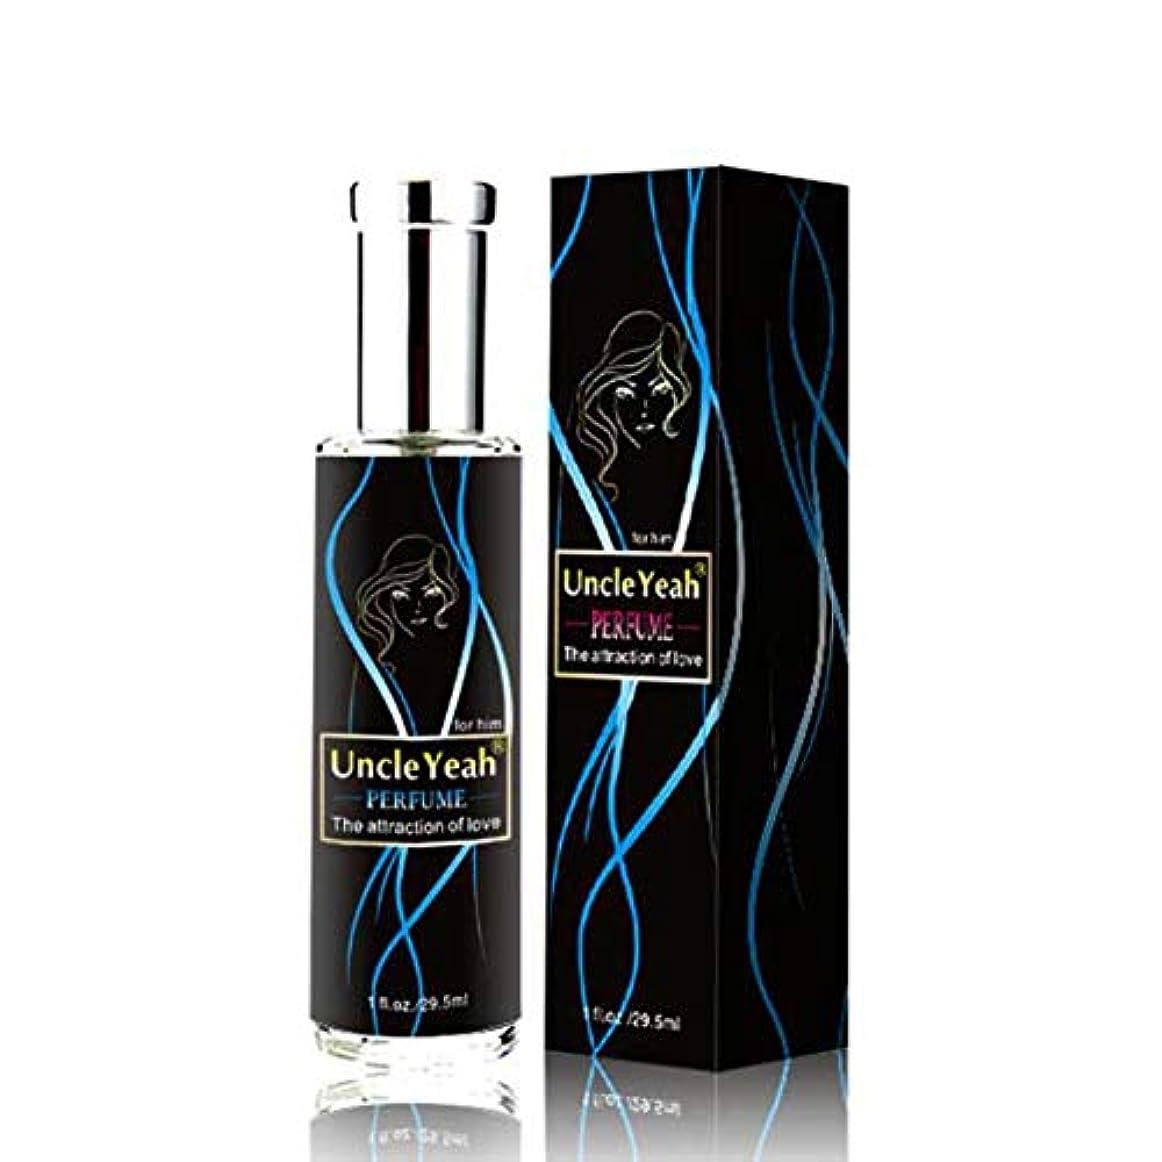 Moresave 男性用フェロモン香水 魅力をアップ 女性にもてる